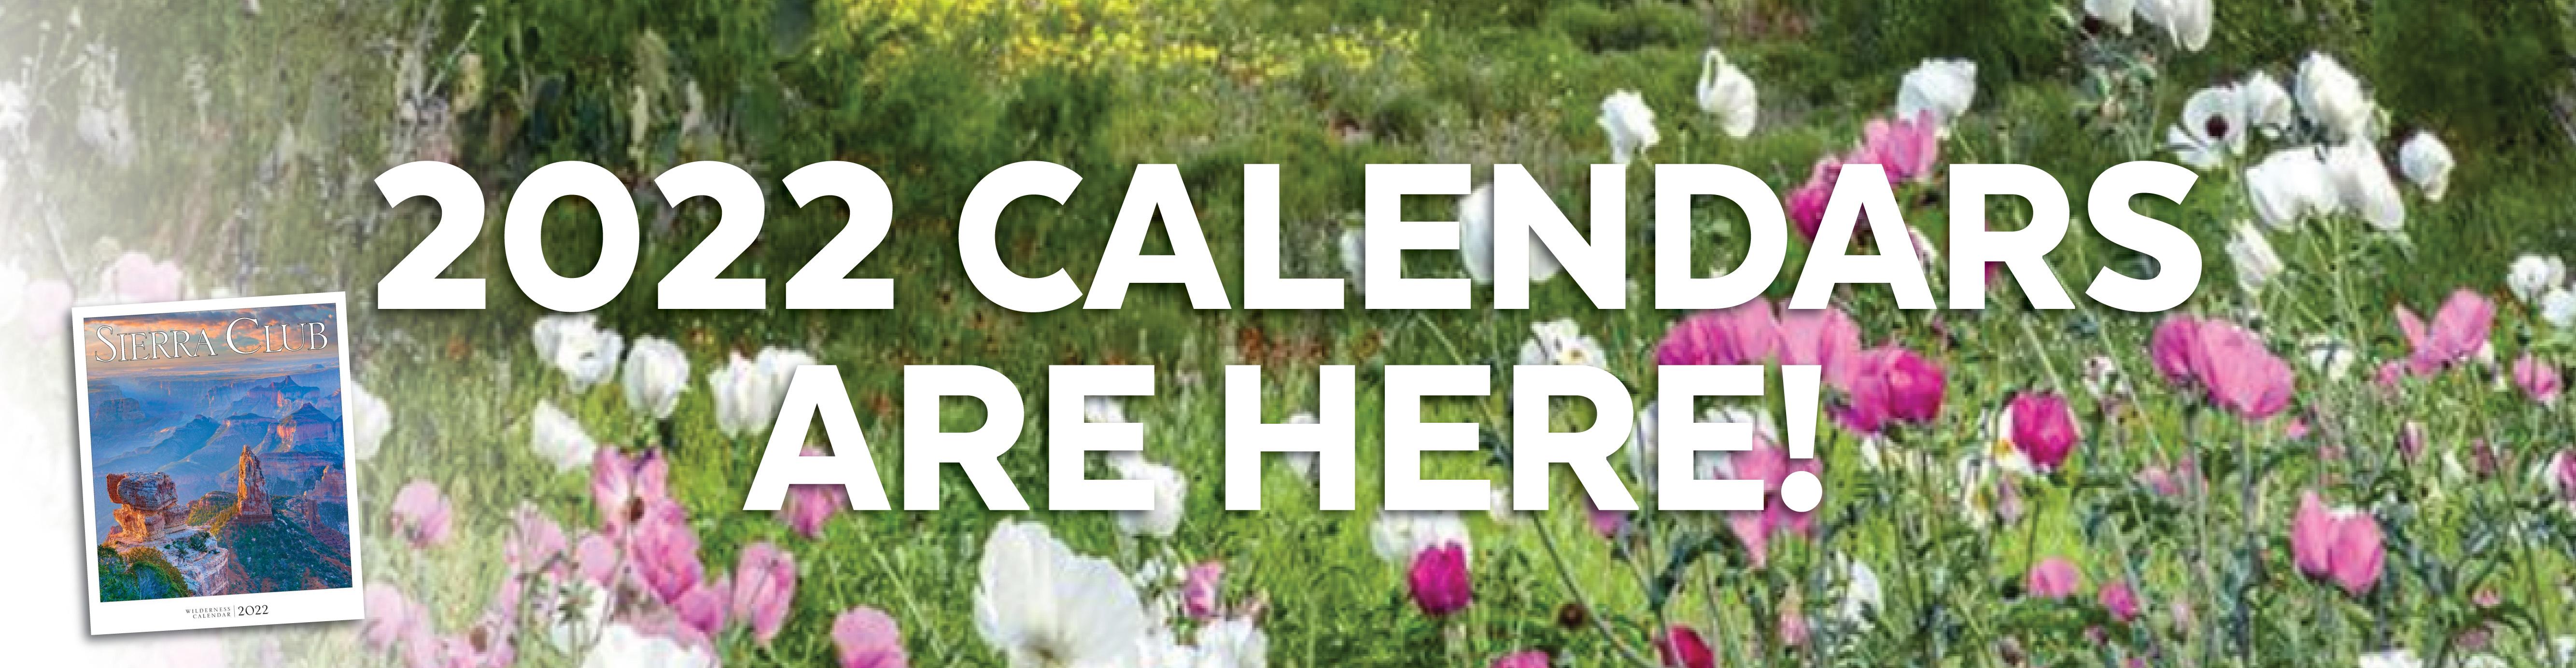 Penn State Academic Calendar Spring 2022.2022 Calendars Calendars Com